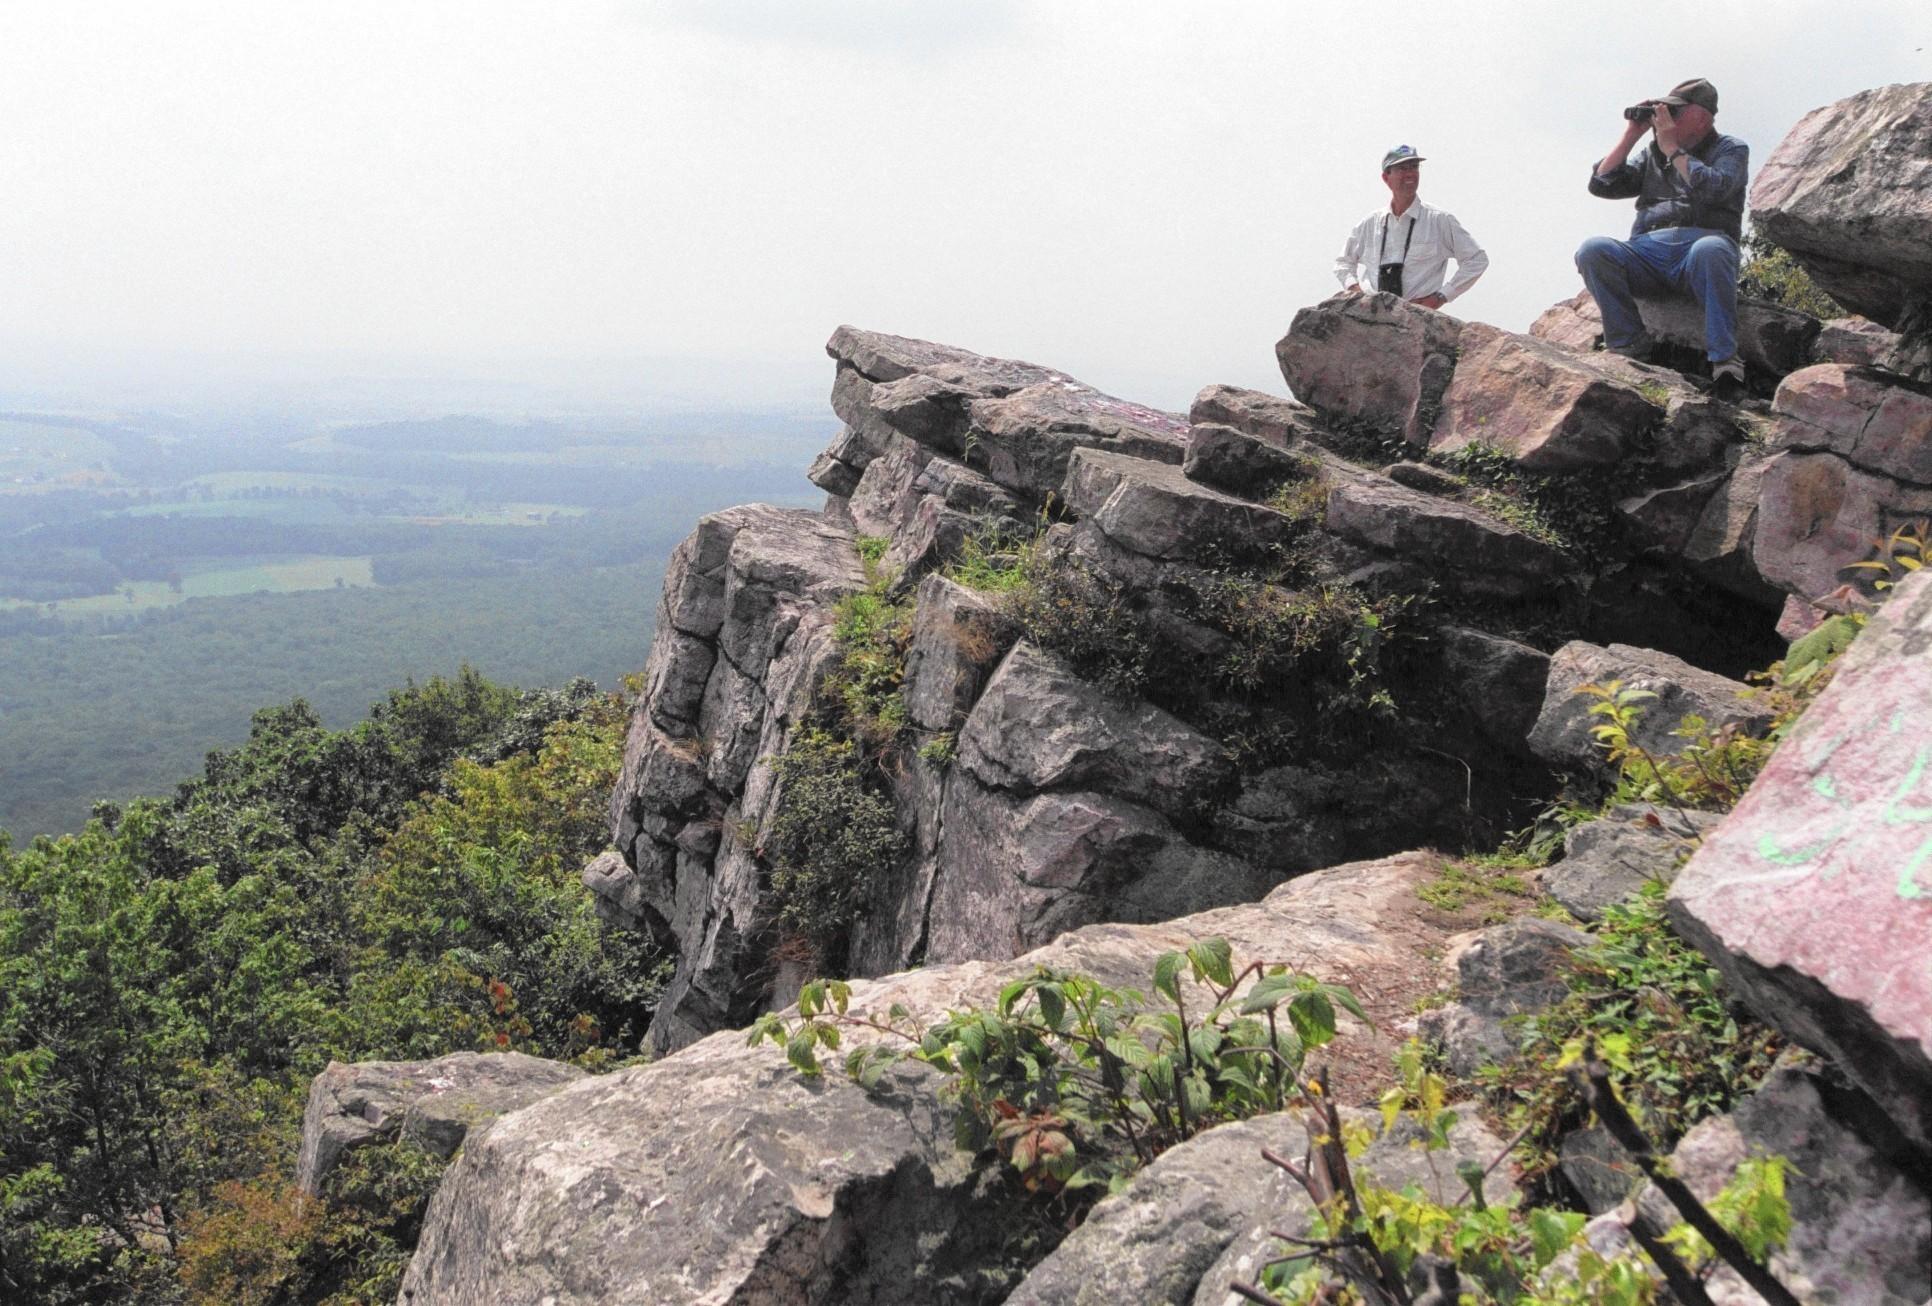 Hiking The Appalachian Trail Through Lehigh Valley Region